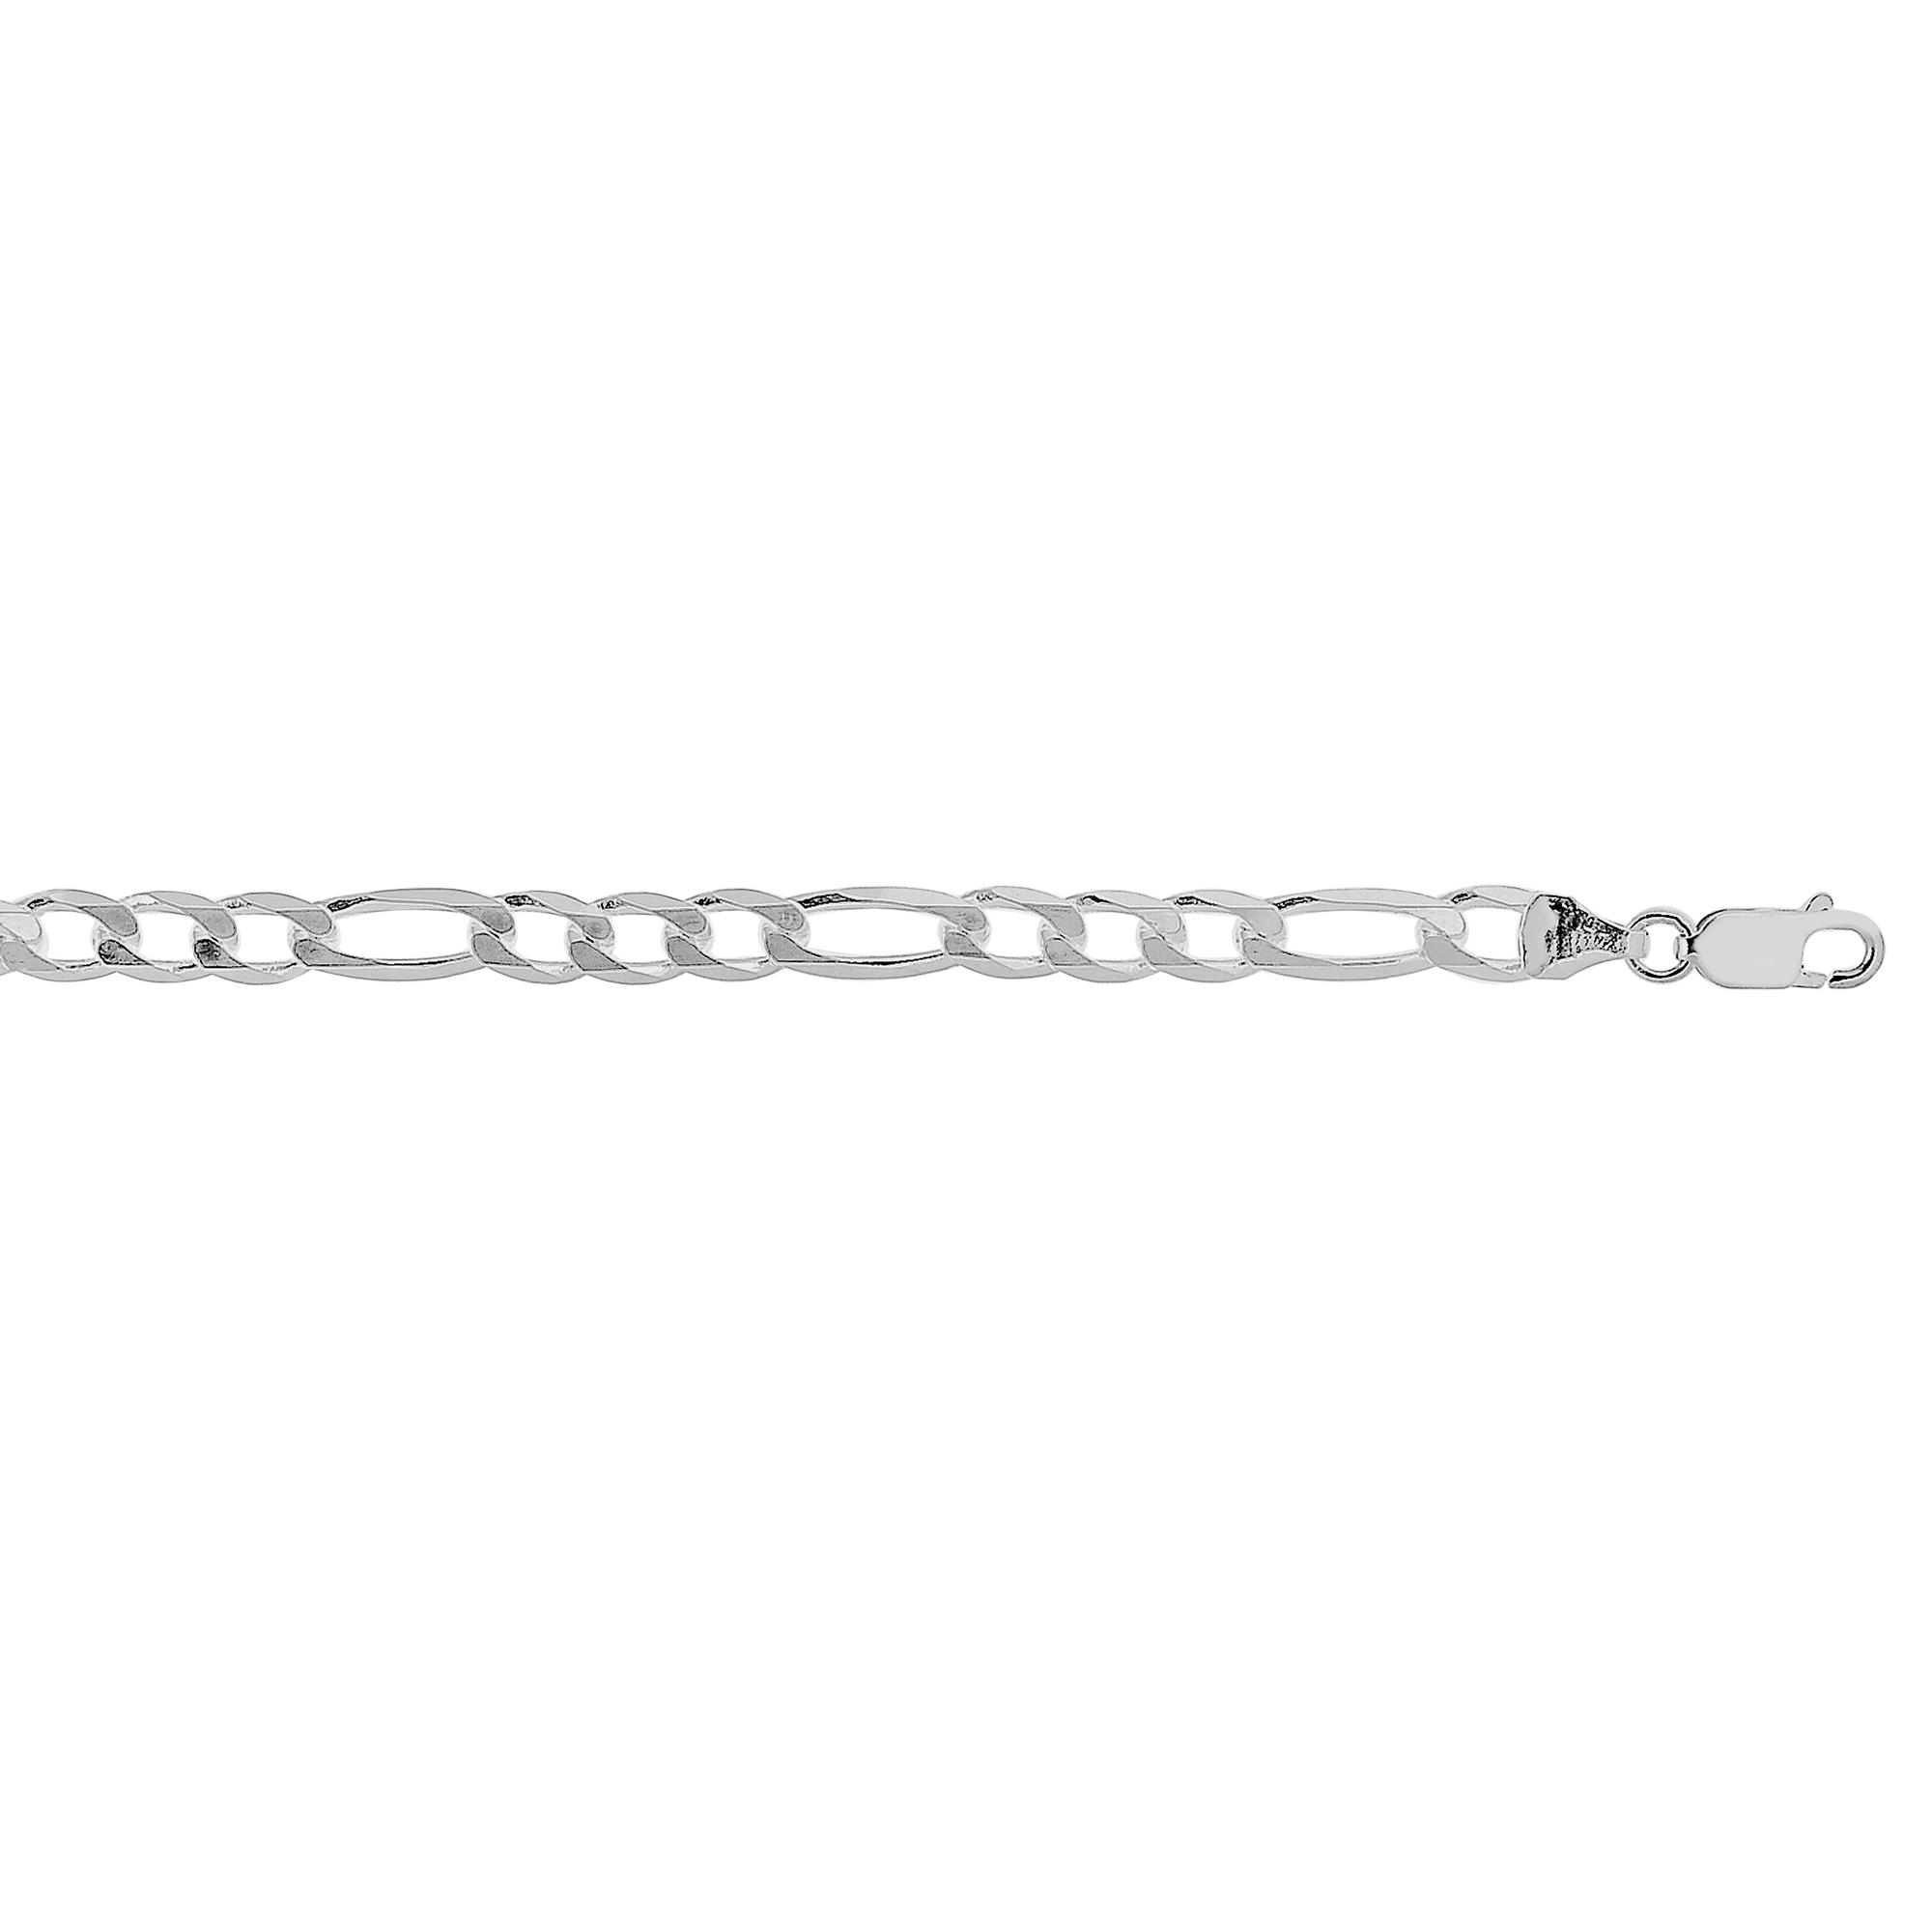 Silver 5.5mm Figaro Chain